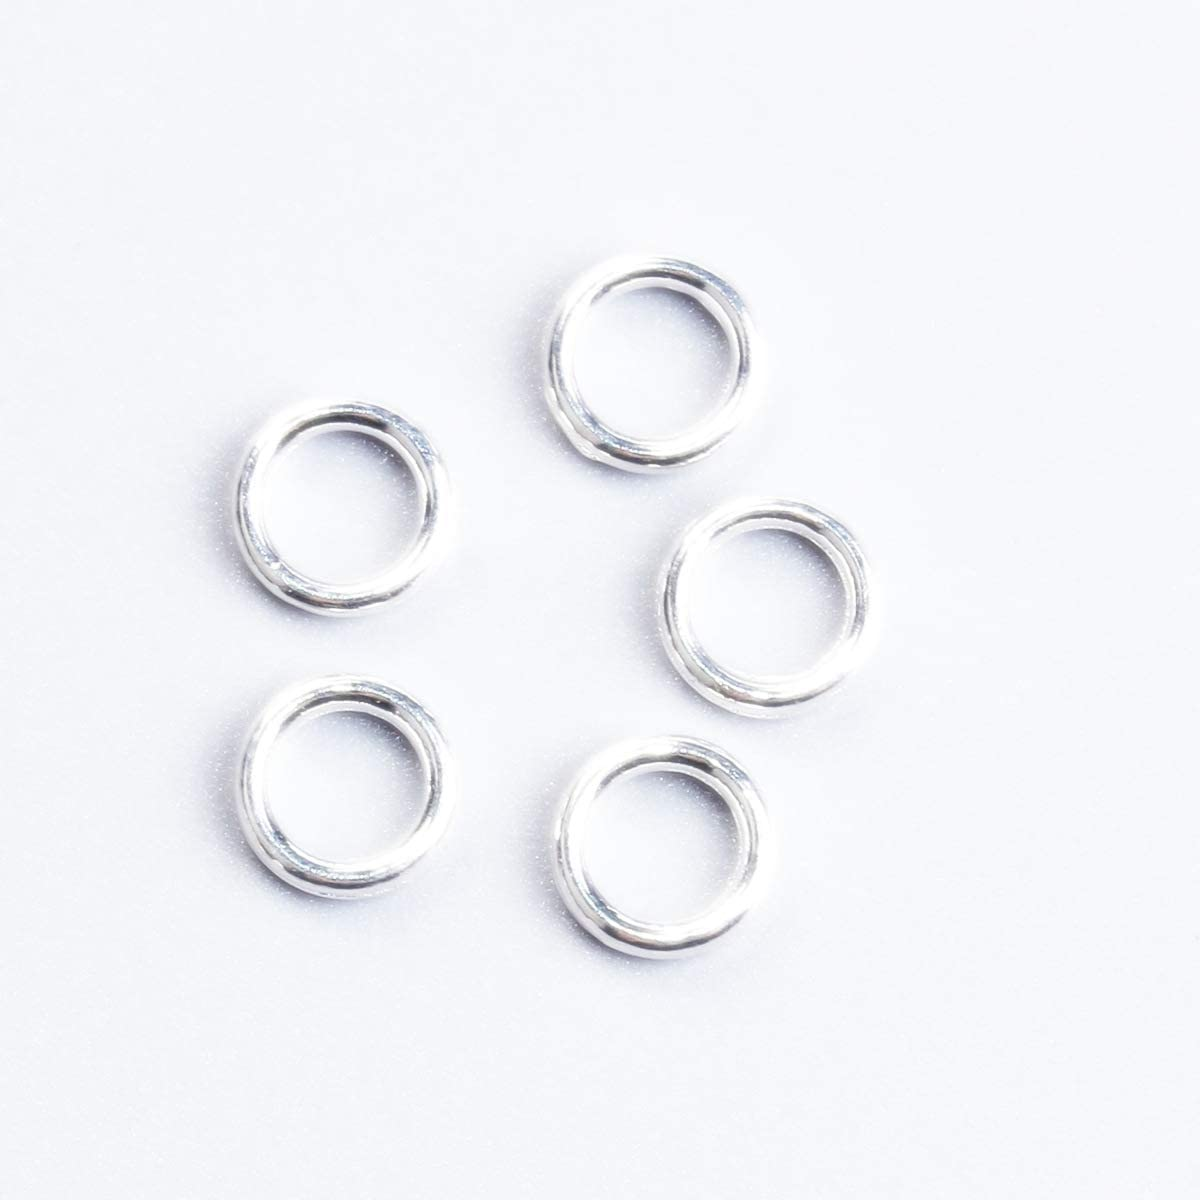 Gauge 22 Jump Rings 500 Silver Plated 6mm Soldered Jump Rings